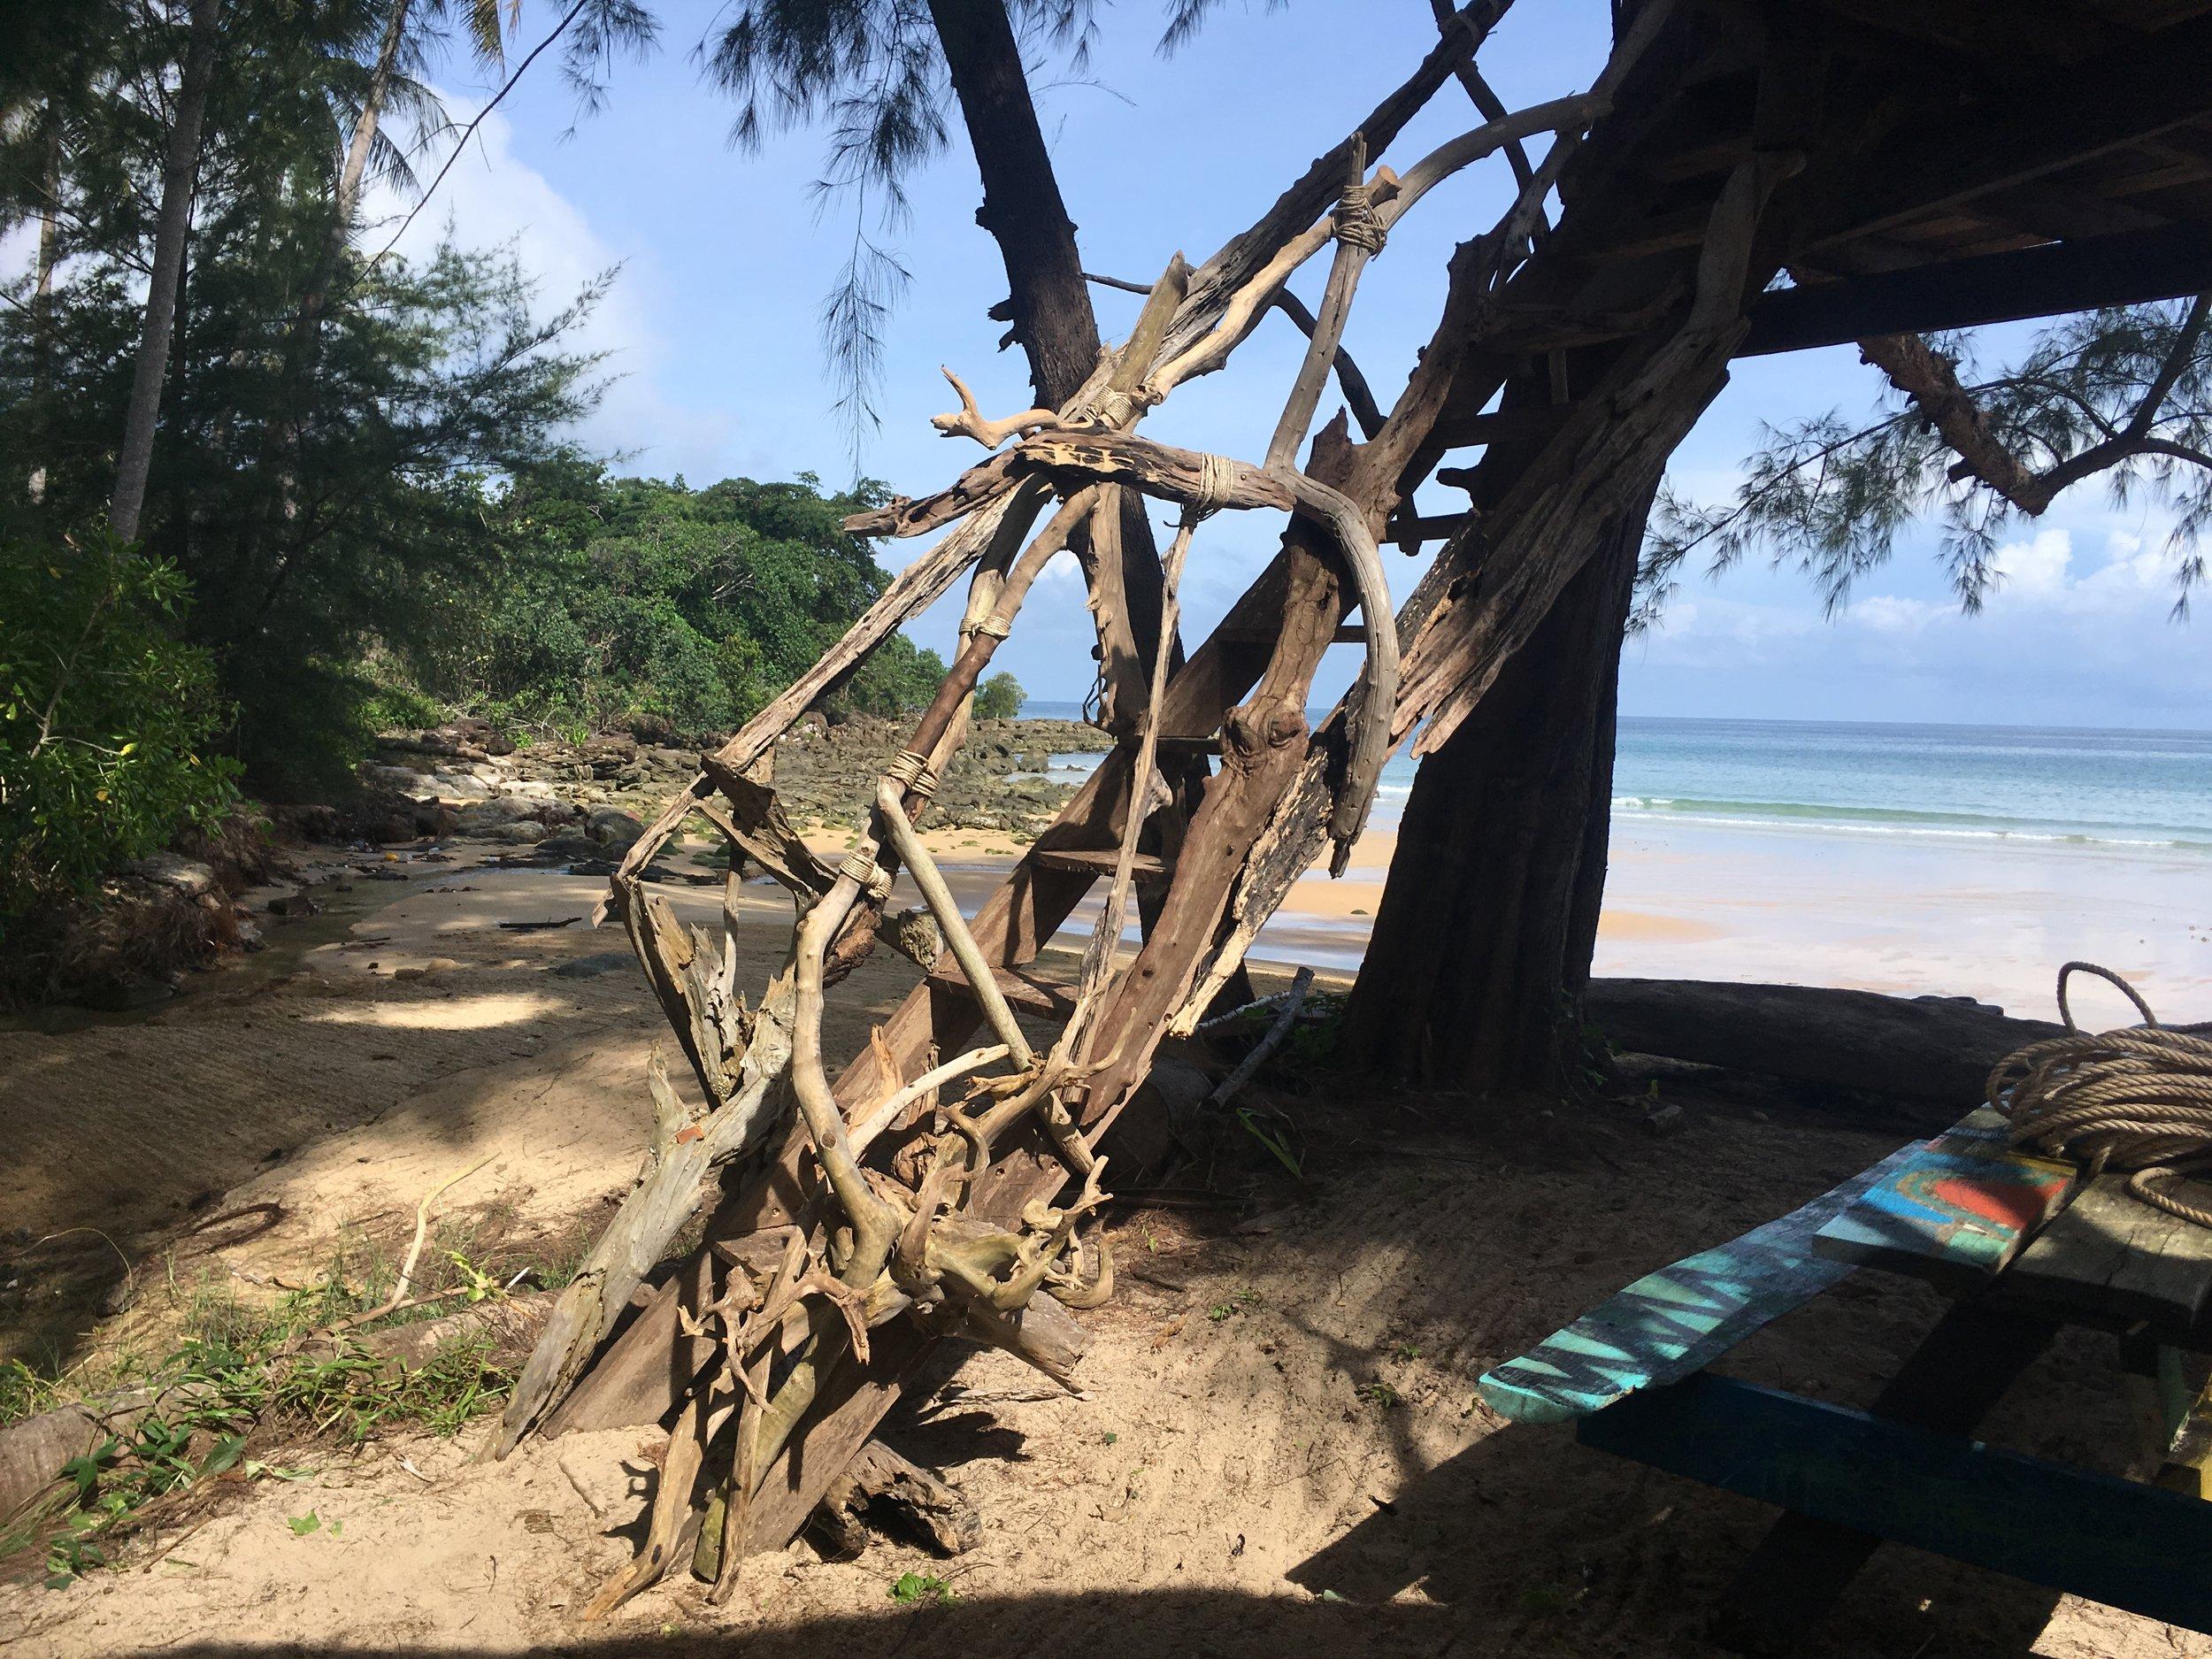 012 Cambodia Lonely beach.JPG